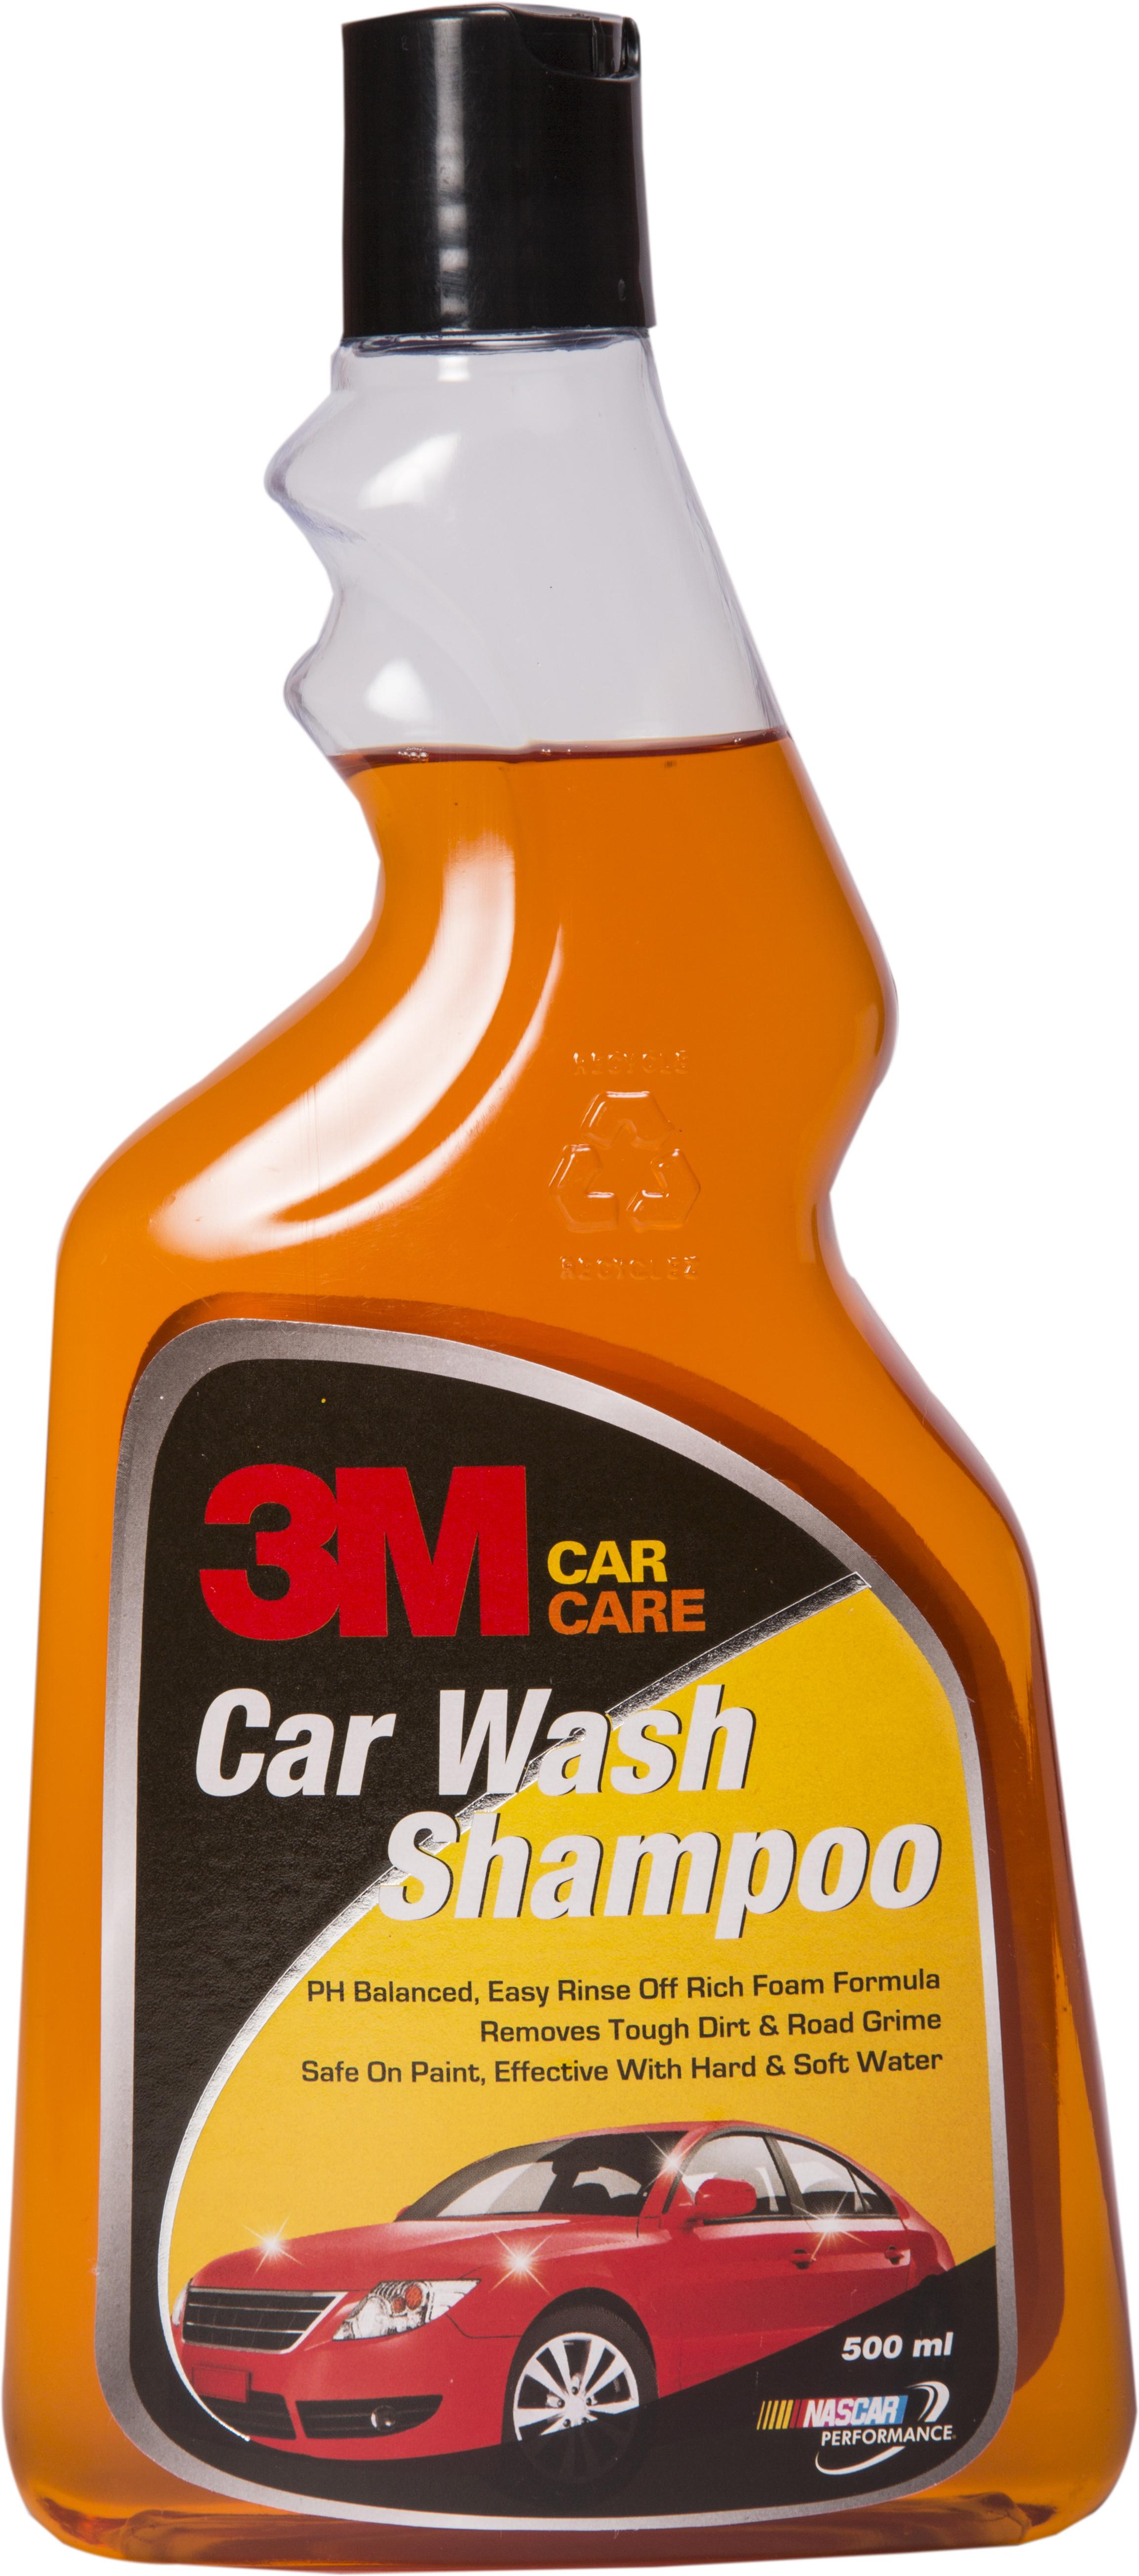 3m car care car shampoo car washer price in india buy 3m car care car shampoo car washer. Black Bedroom Furniture Sets. Home Design Ideas